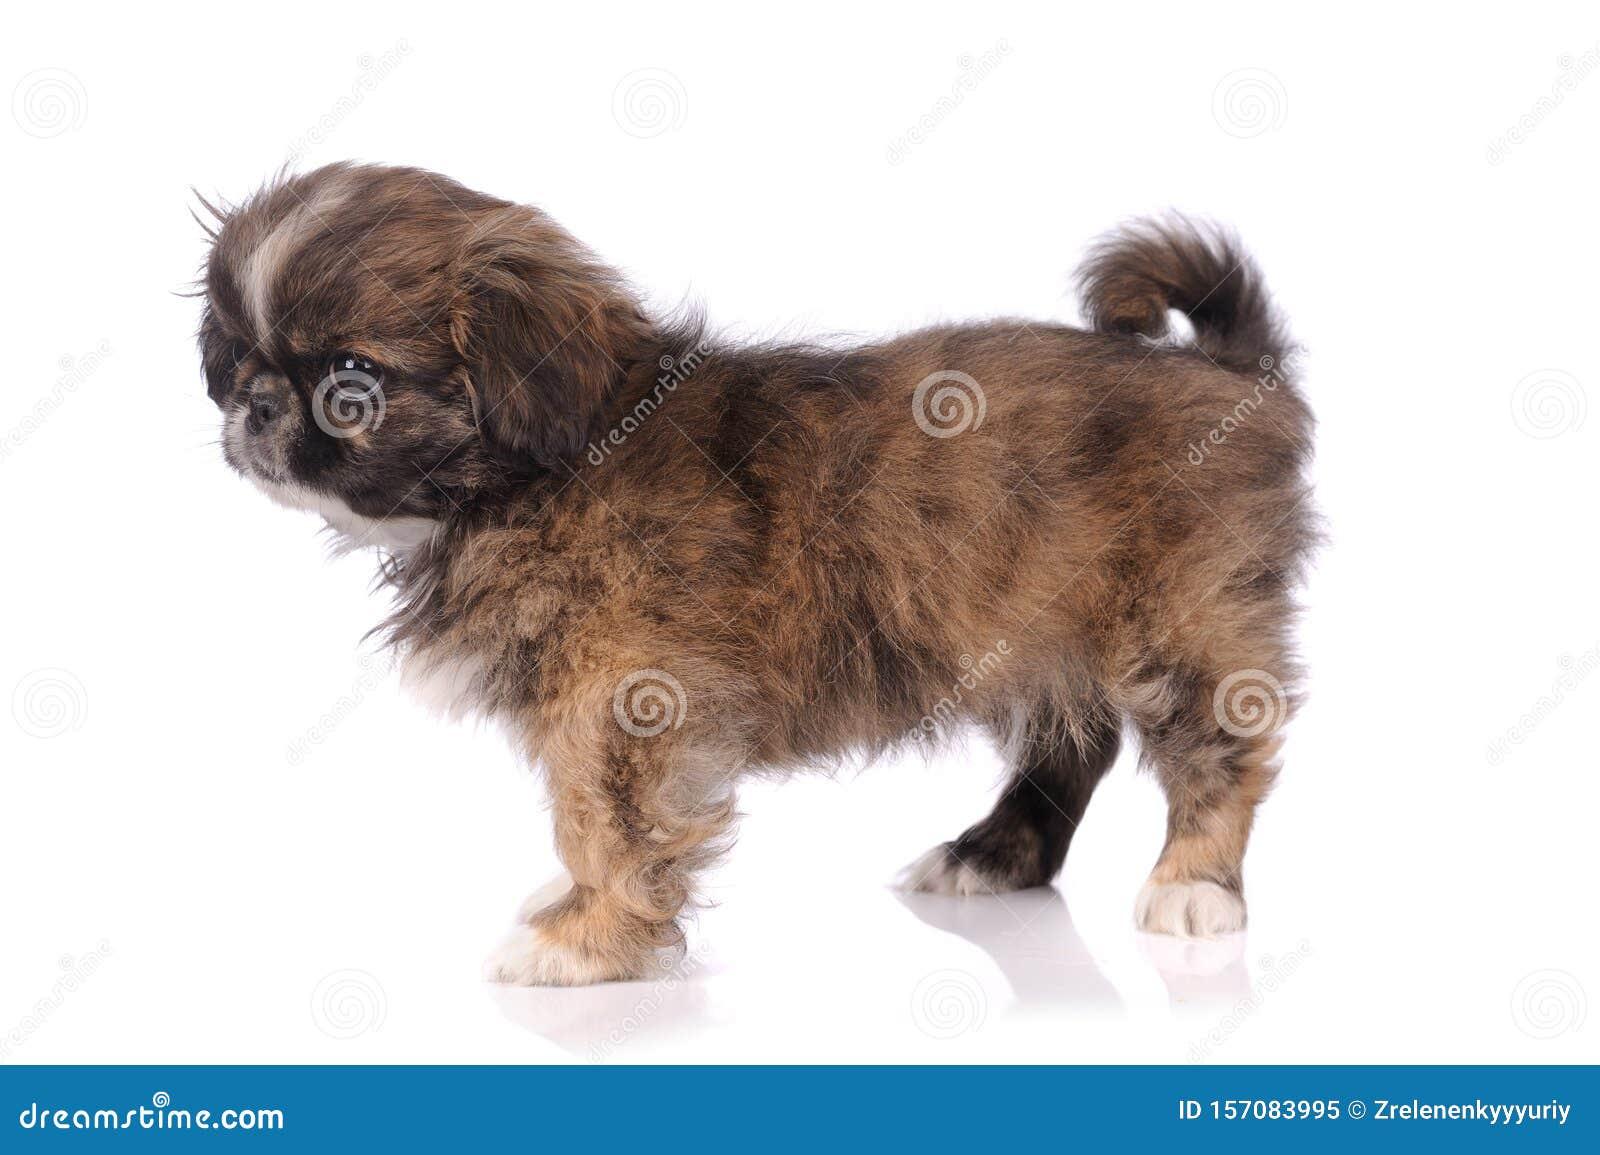 Small Baby Pekingese Dog Isolated Over The White Background Stock Image Image Of Pretty Breed 157083995